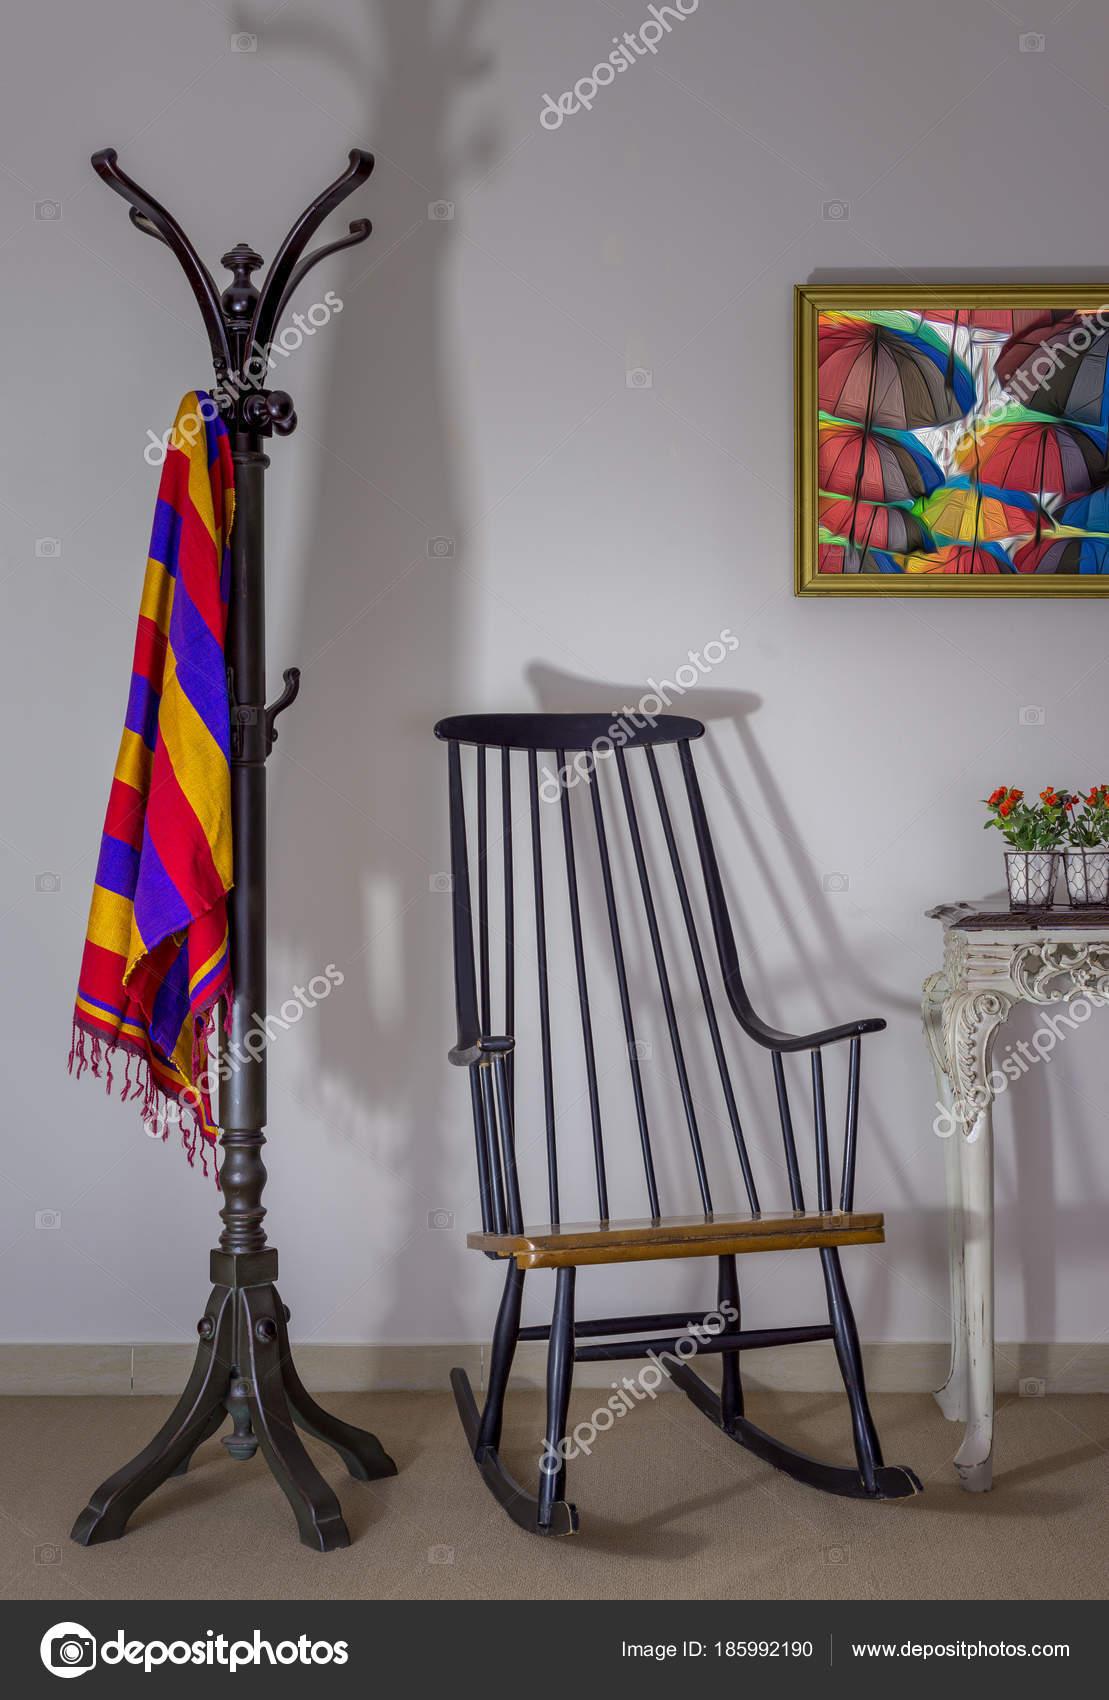 Tremendous Interior Shot Of Vintage Rocking Chair Coat Hanger And Spiritservingveterans Wood Chair Design Ideas Spiritservingveteransorg